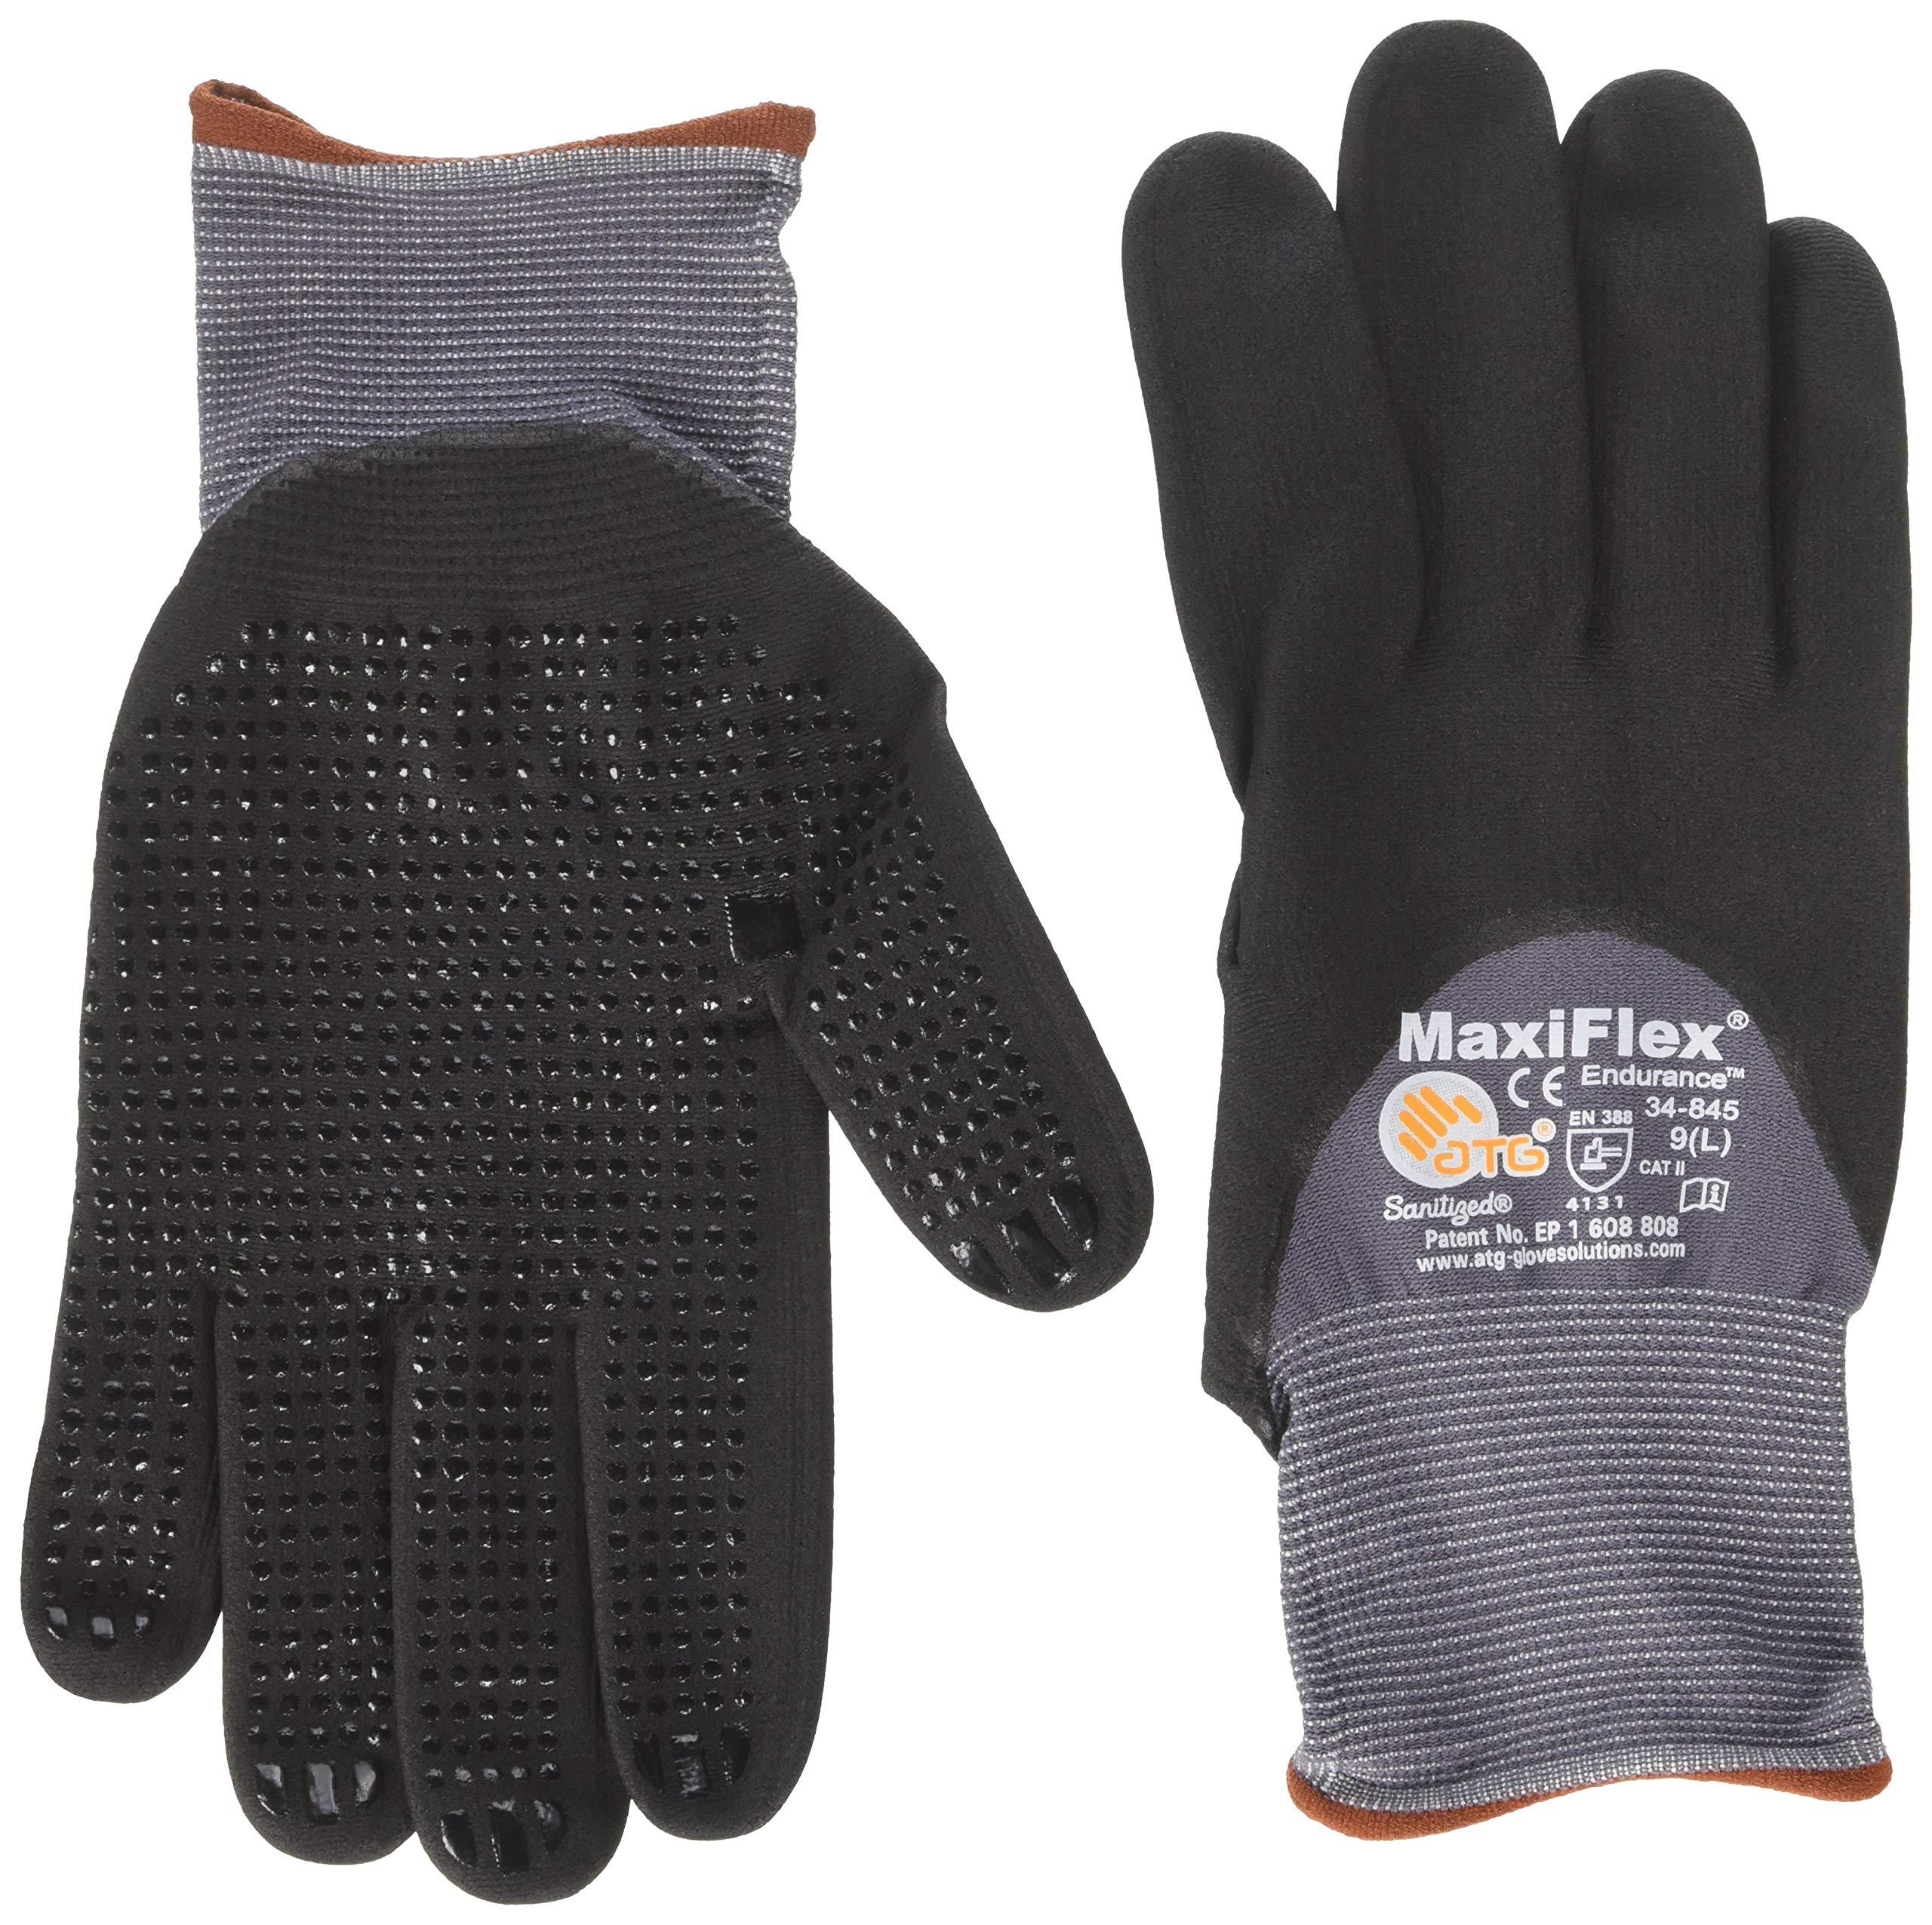 ATG 34-845/L Maxiflex Endurance Nylon, Micro-Foam Nitrile 3/4 Grip Gloves, Large, Black/Gray, 12 Pairper Pack